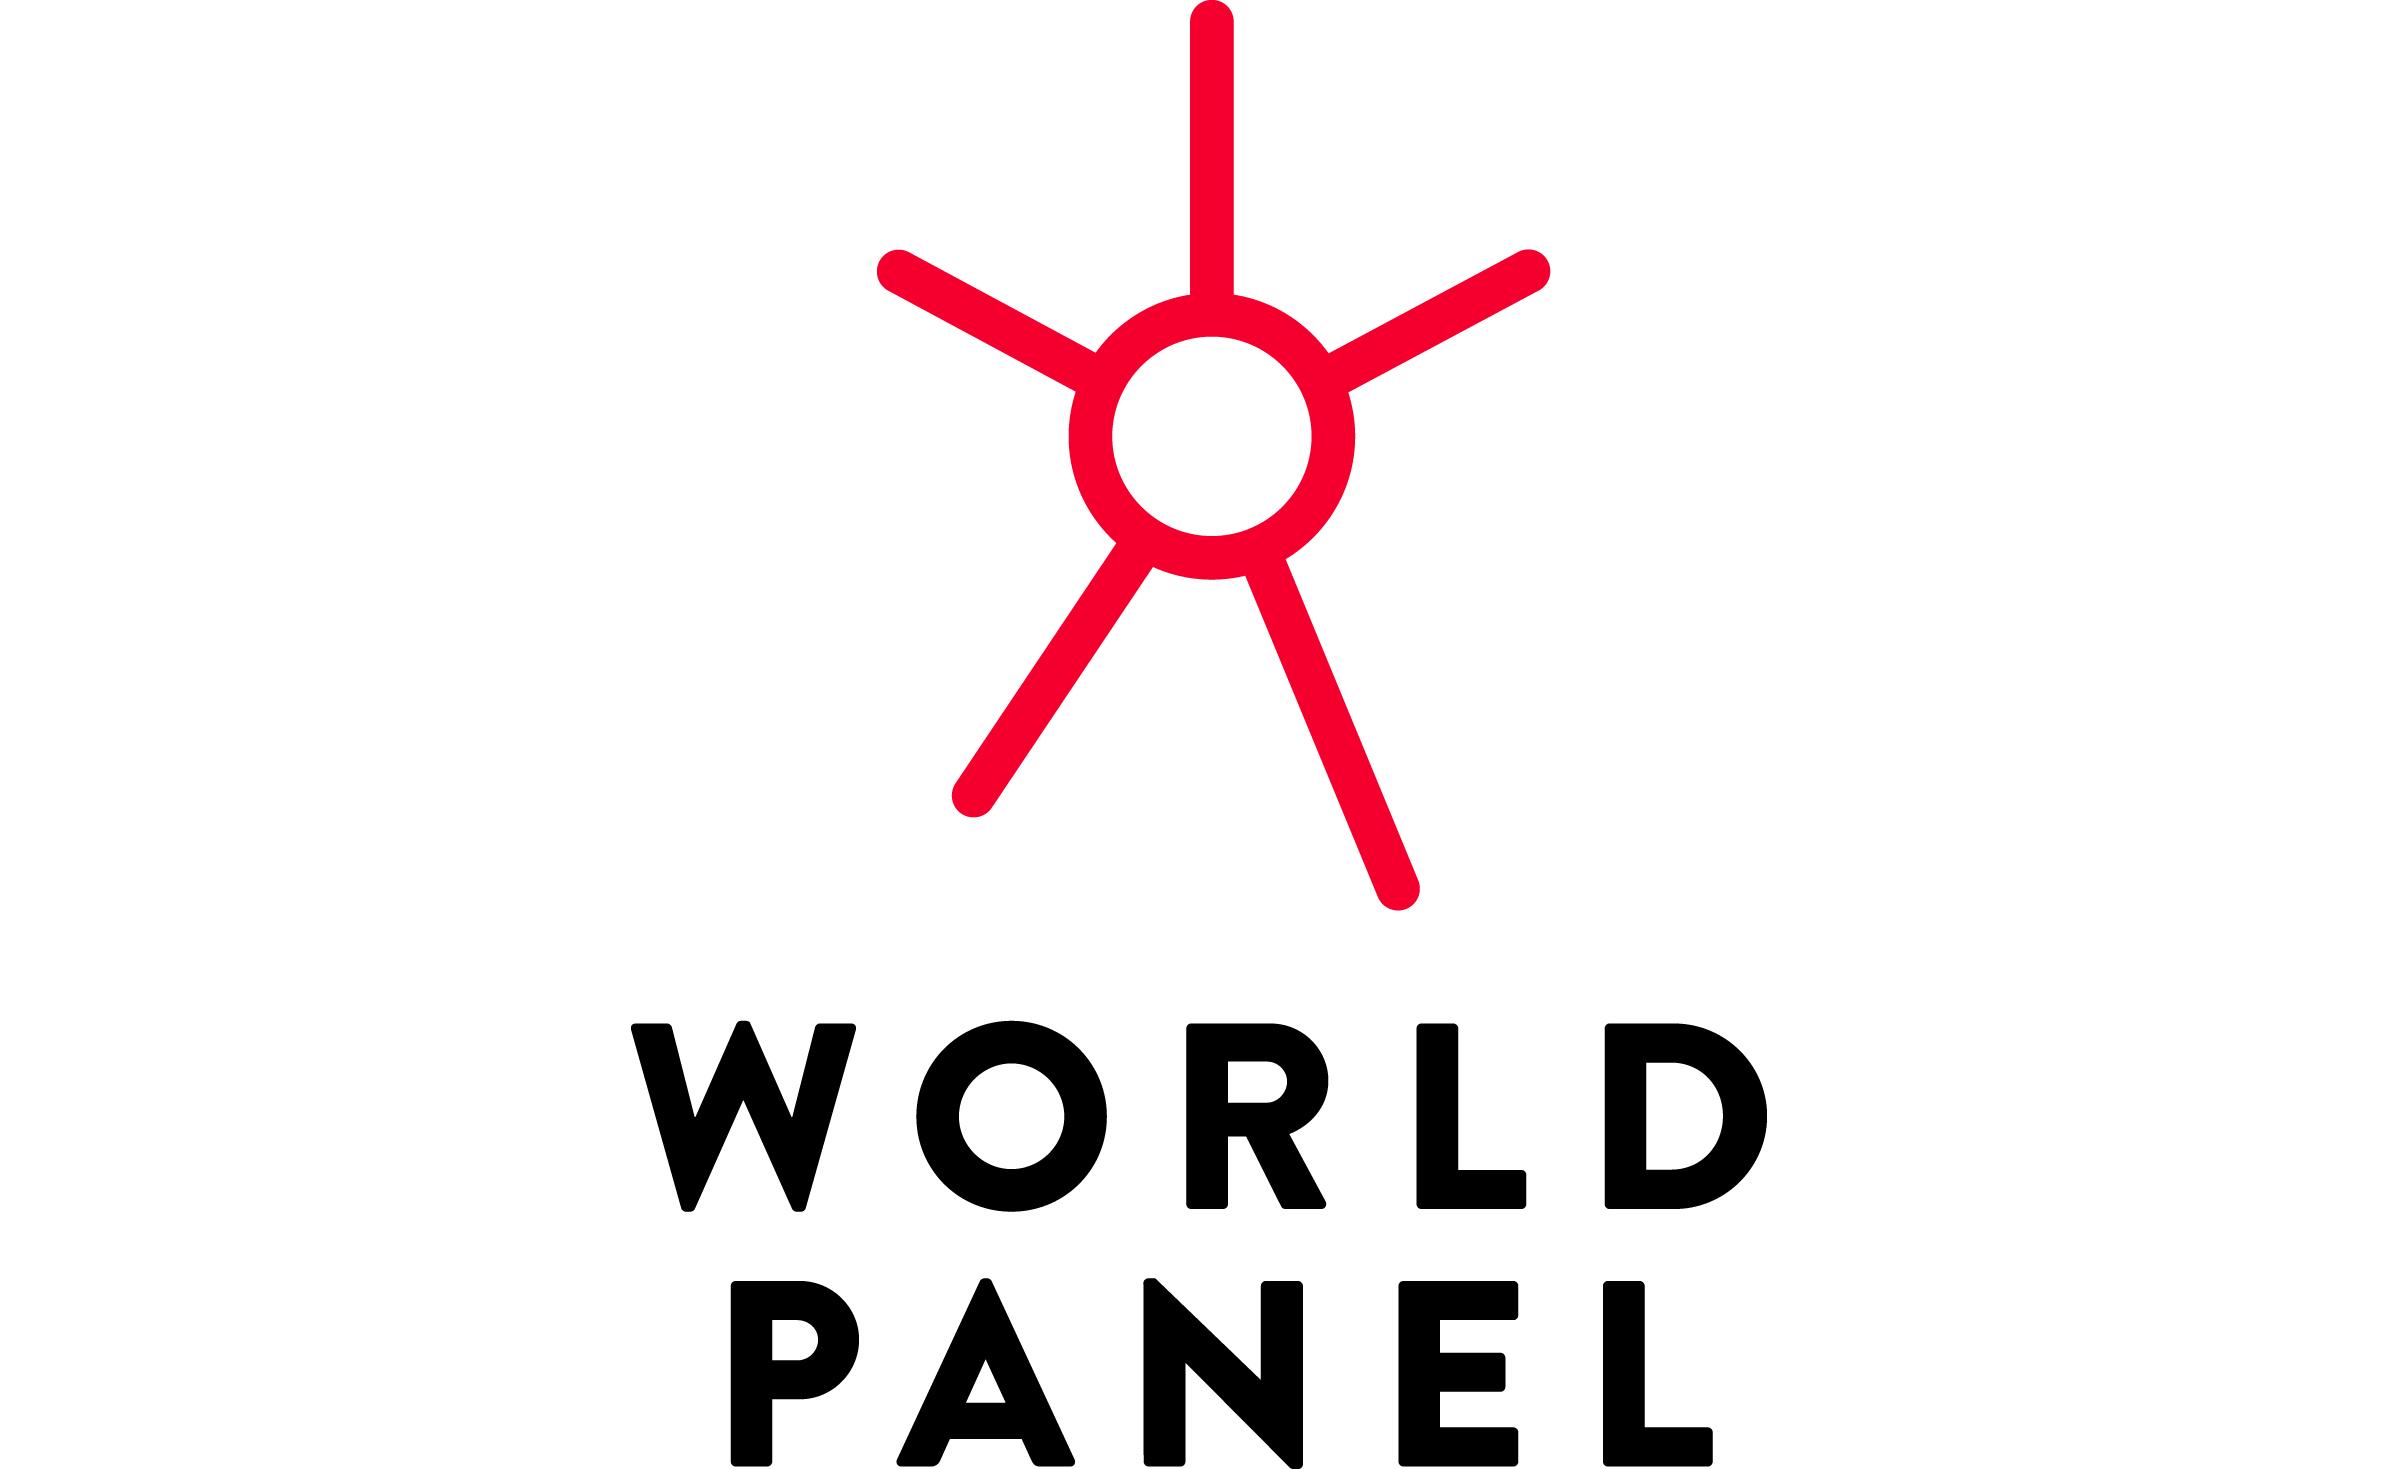 World Panel, Inc.